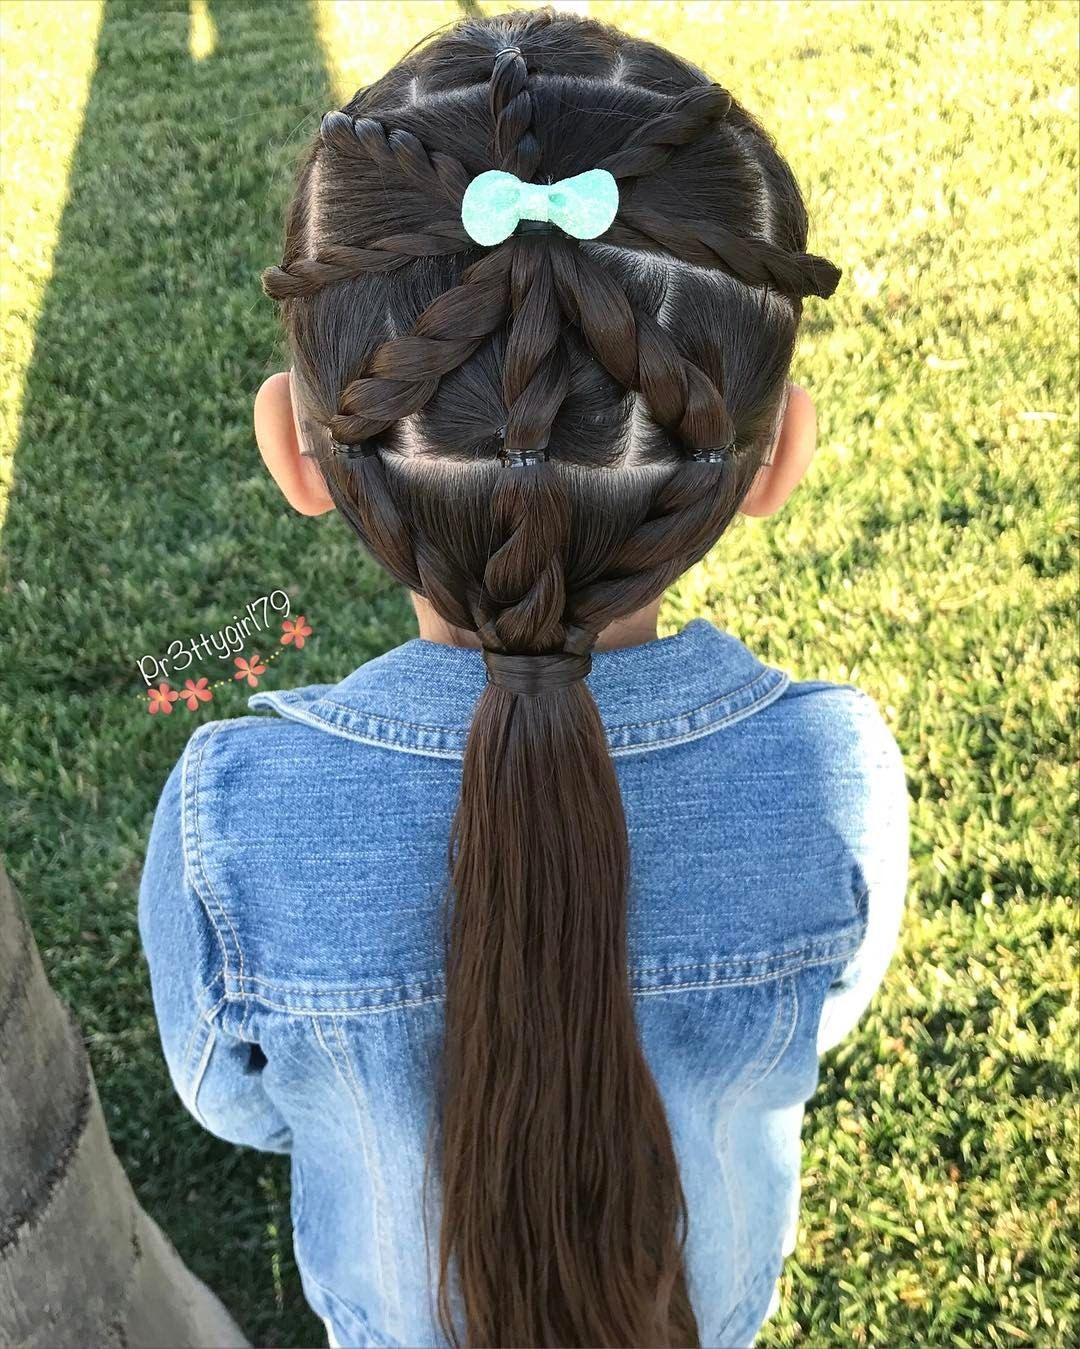 Pin by Pr3ttygirl79 on Pr3tty Hairstyles in 2019 | Hair ...